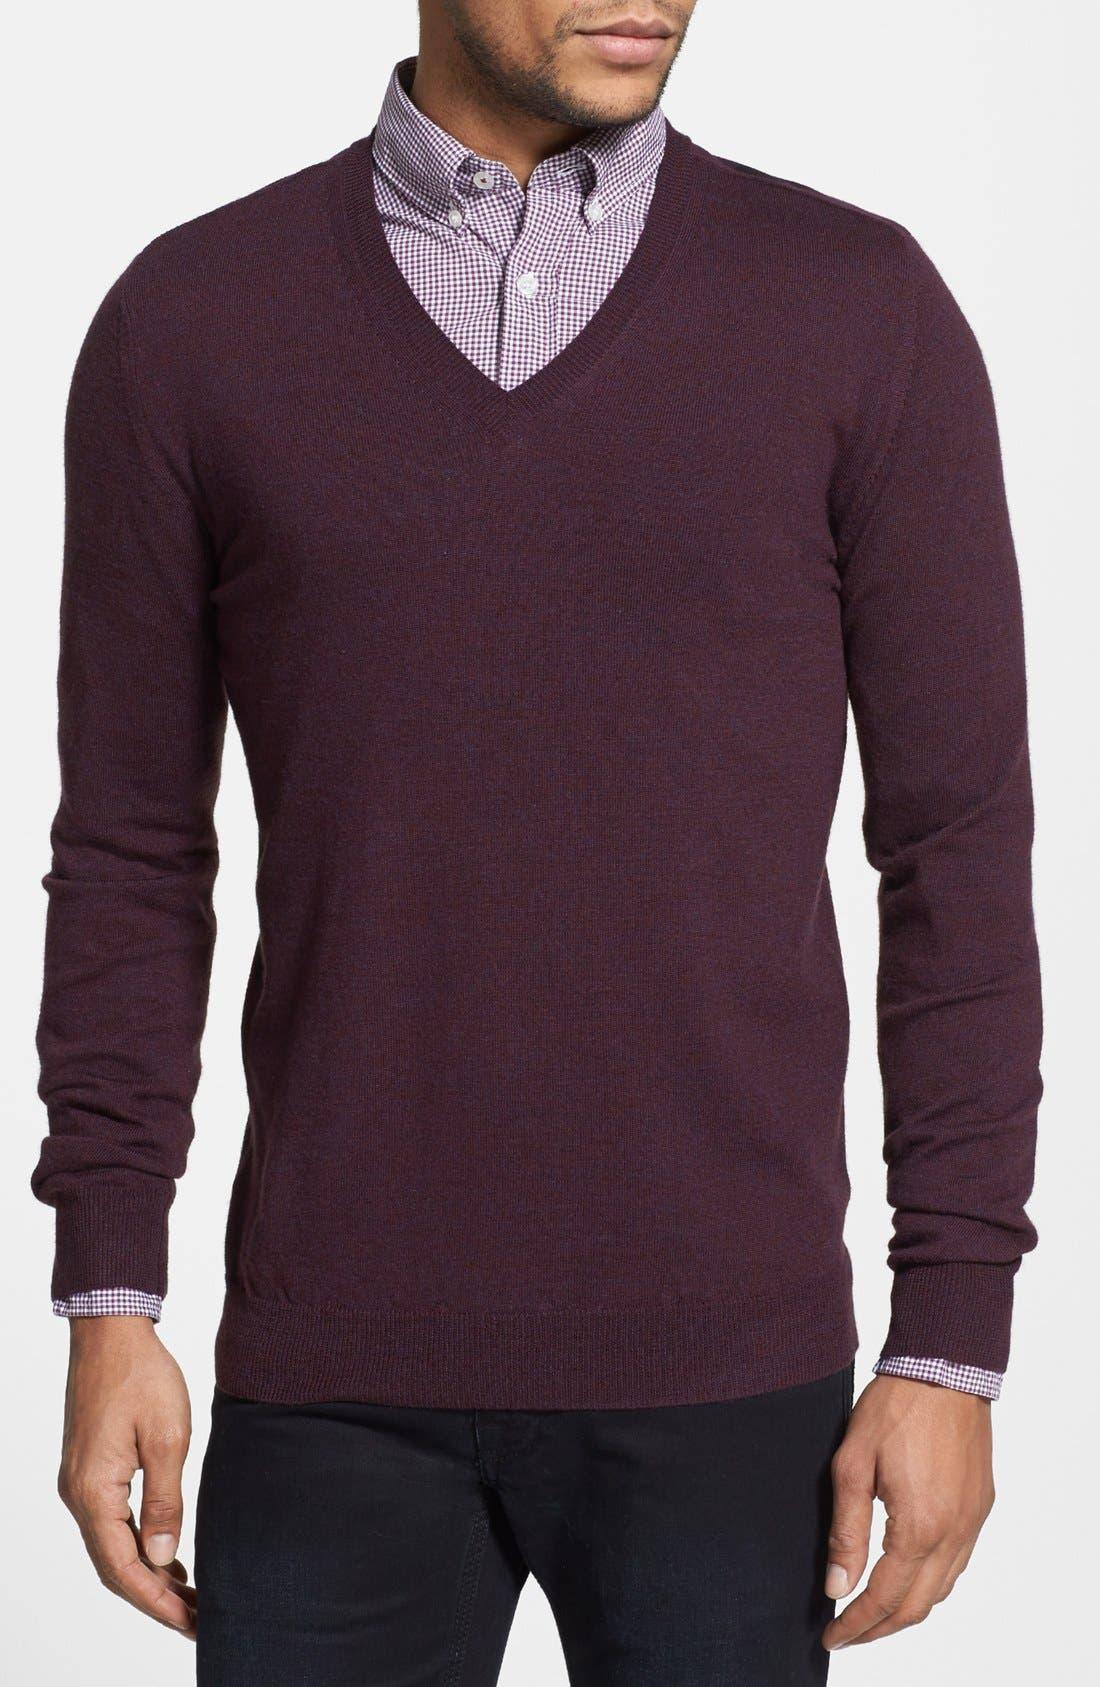 Main Image - Burberry Brit Trim Fit Check Shoulder V-Neck Merino Wool Sweater